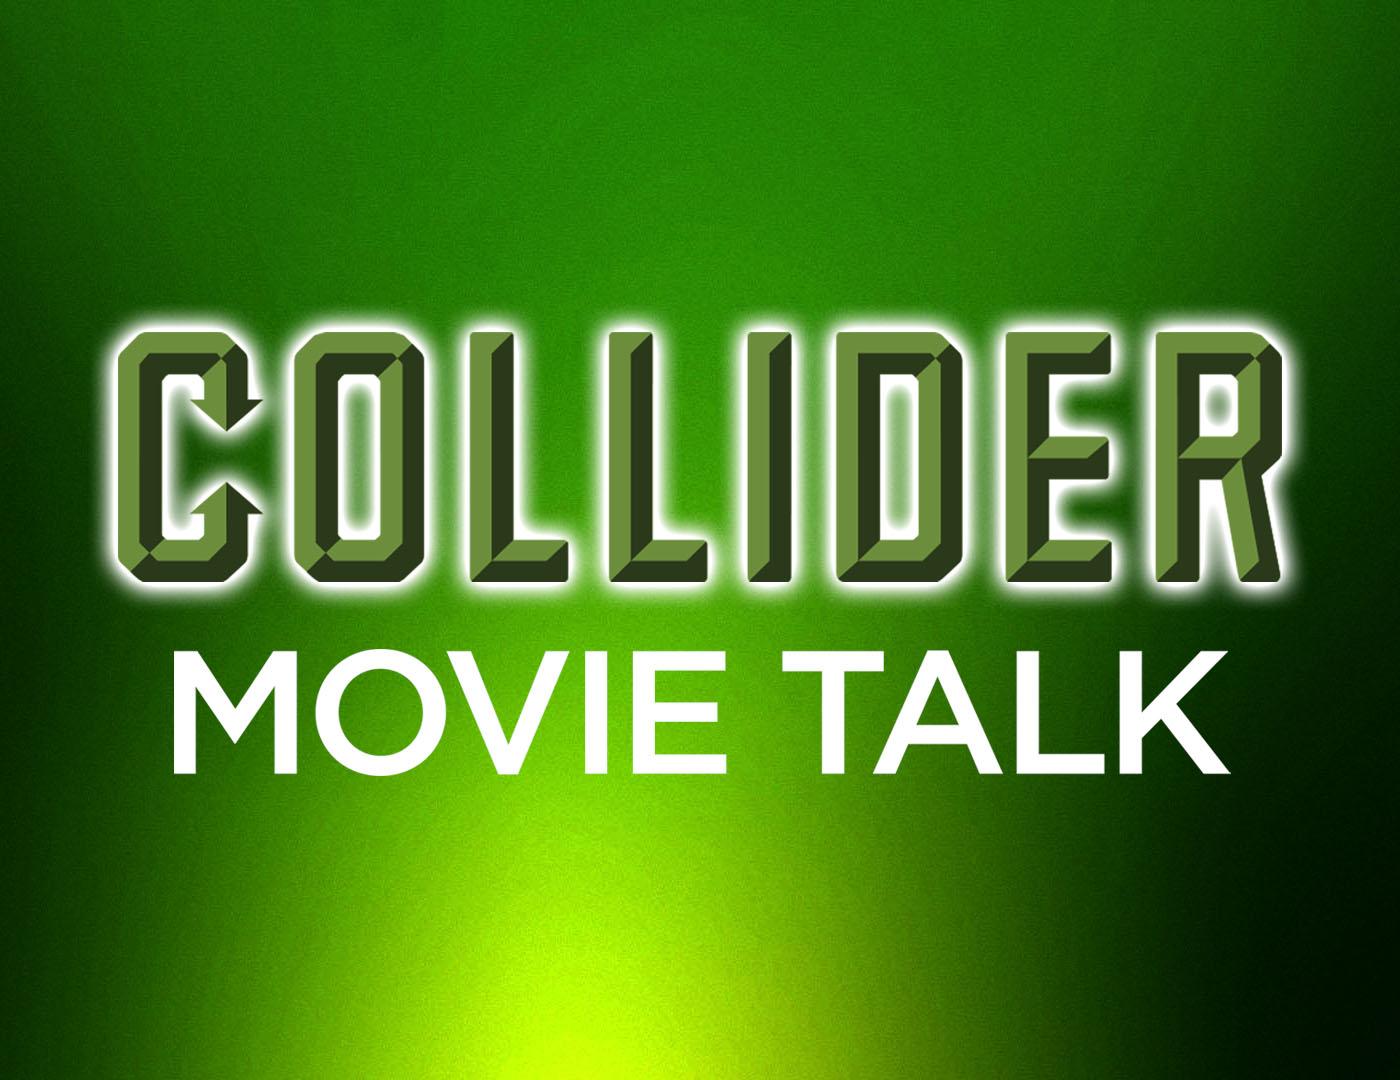 Collider Movie Talk - The Force Awakens Sinks Titanic